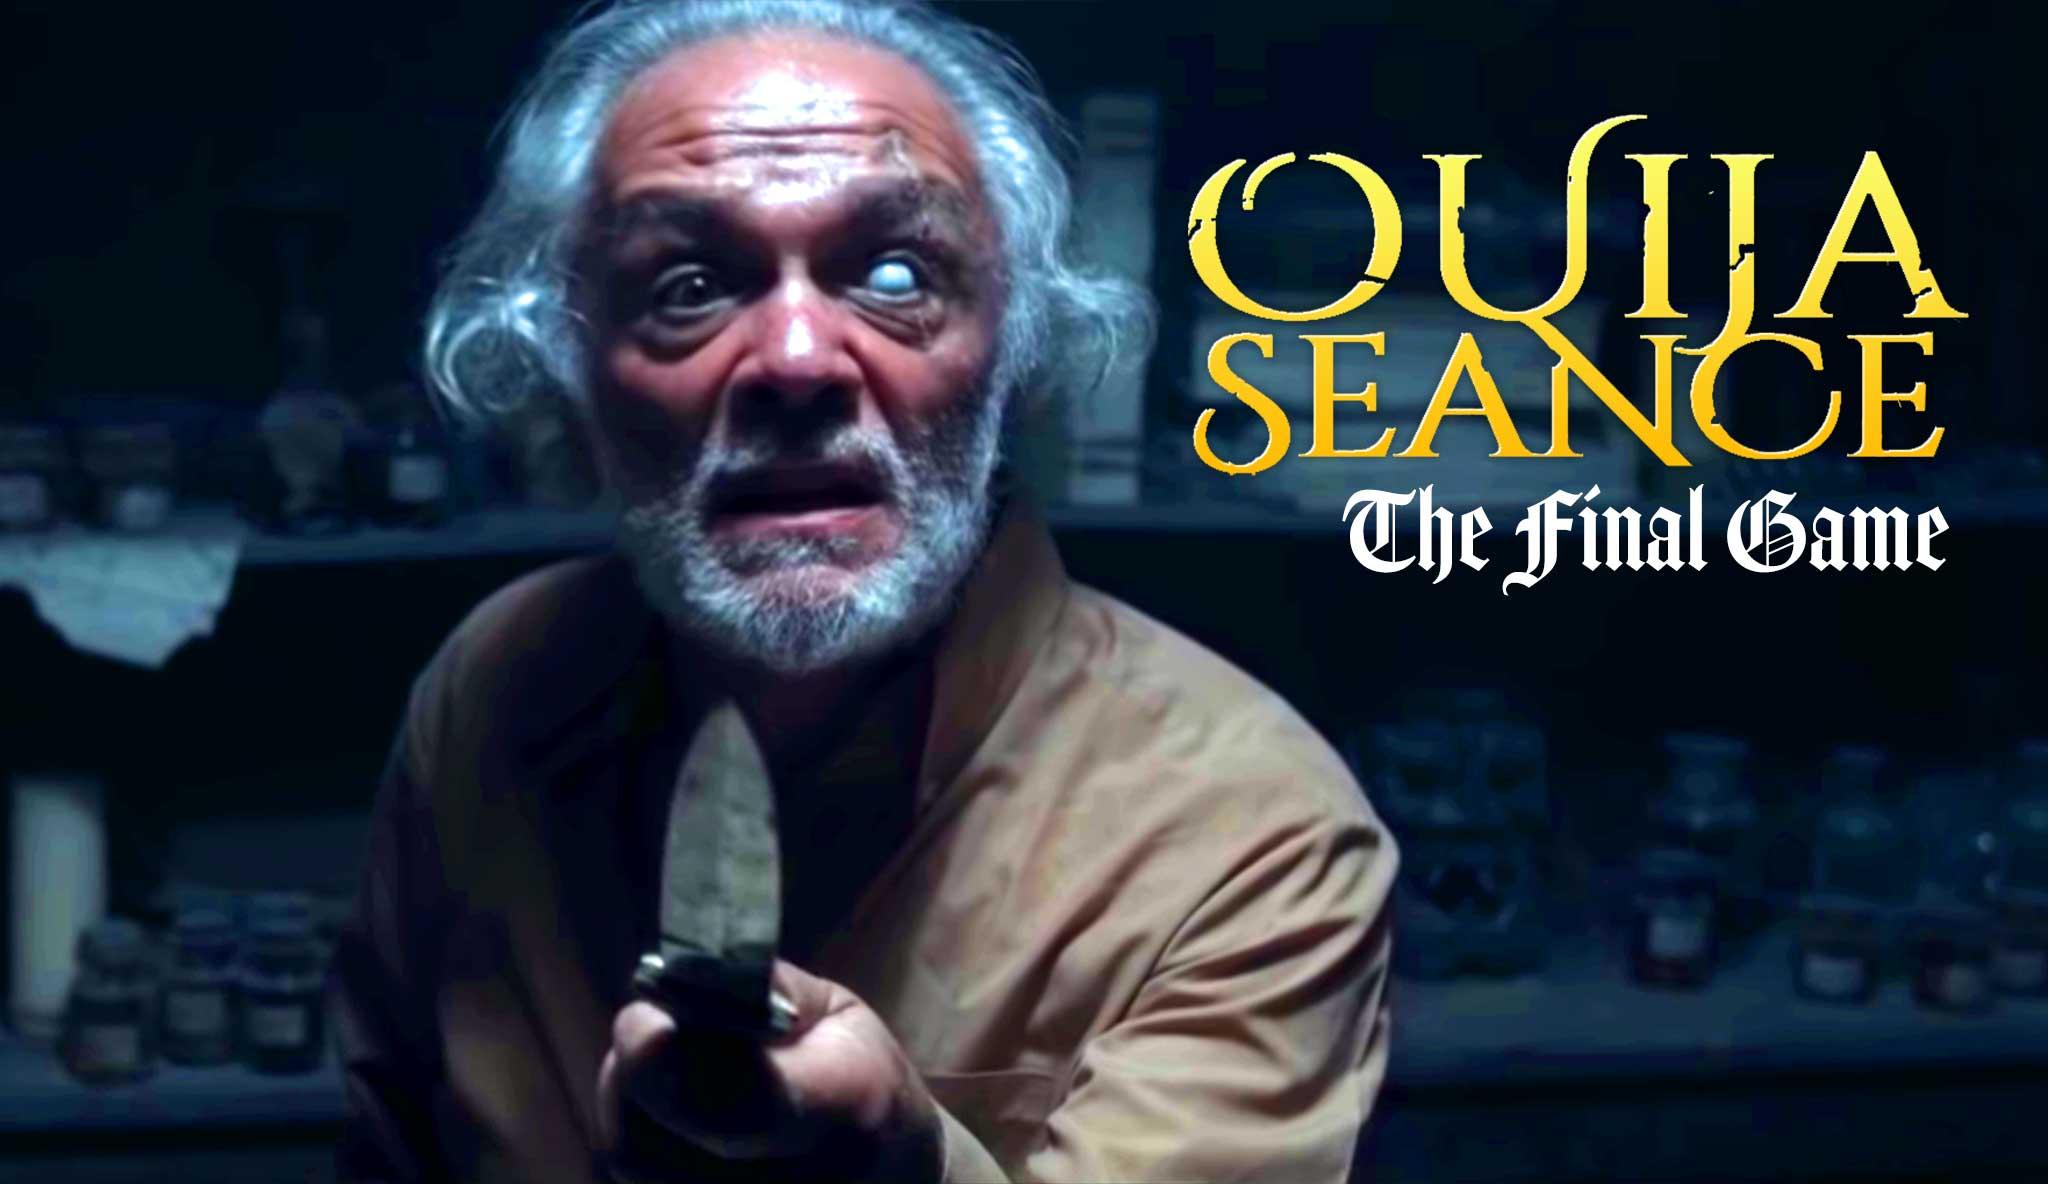 ouija-seance-the-final-game\header.jpg